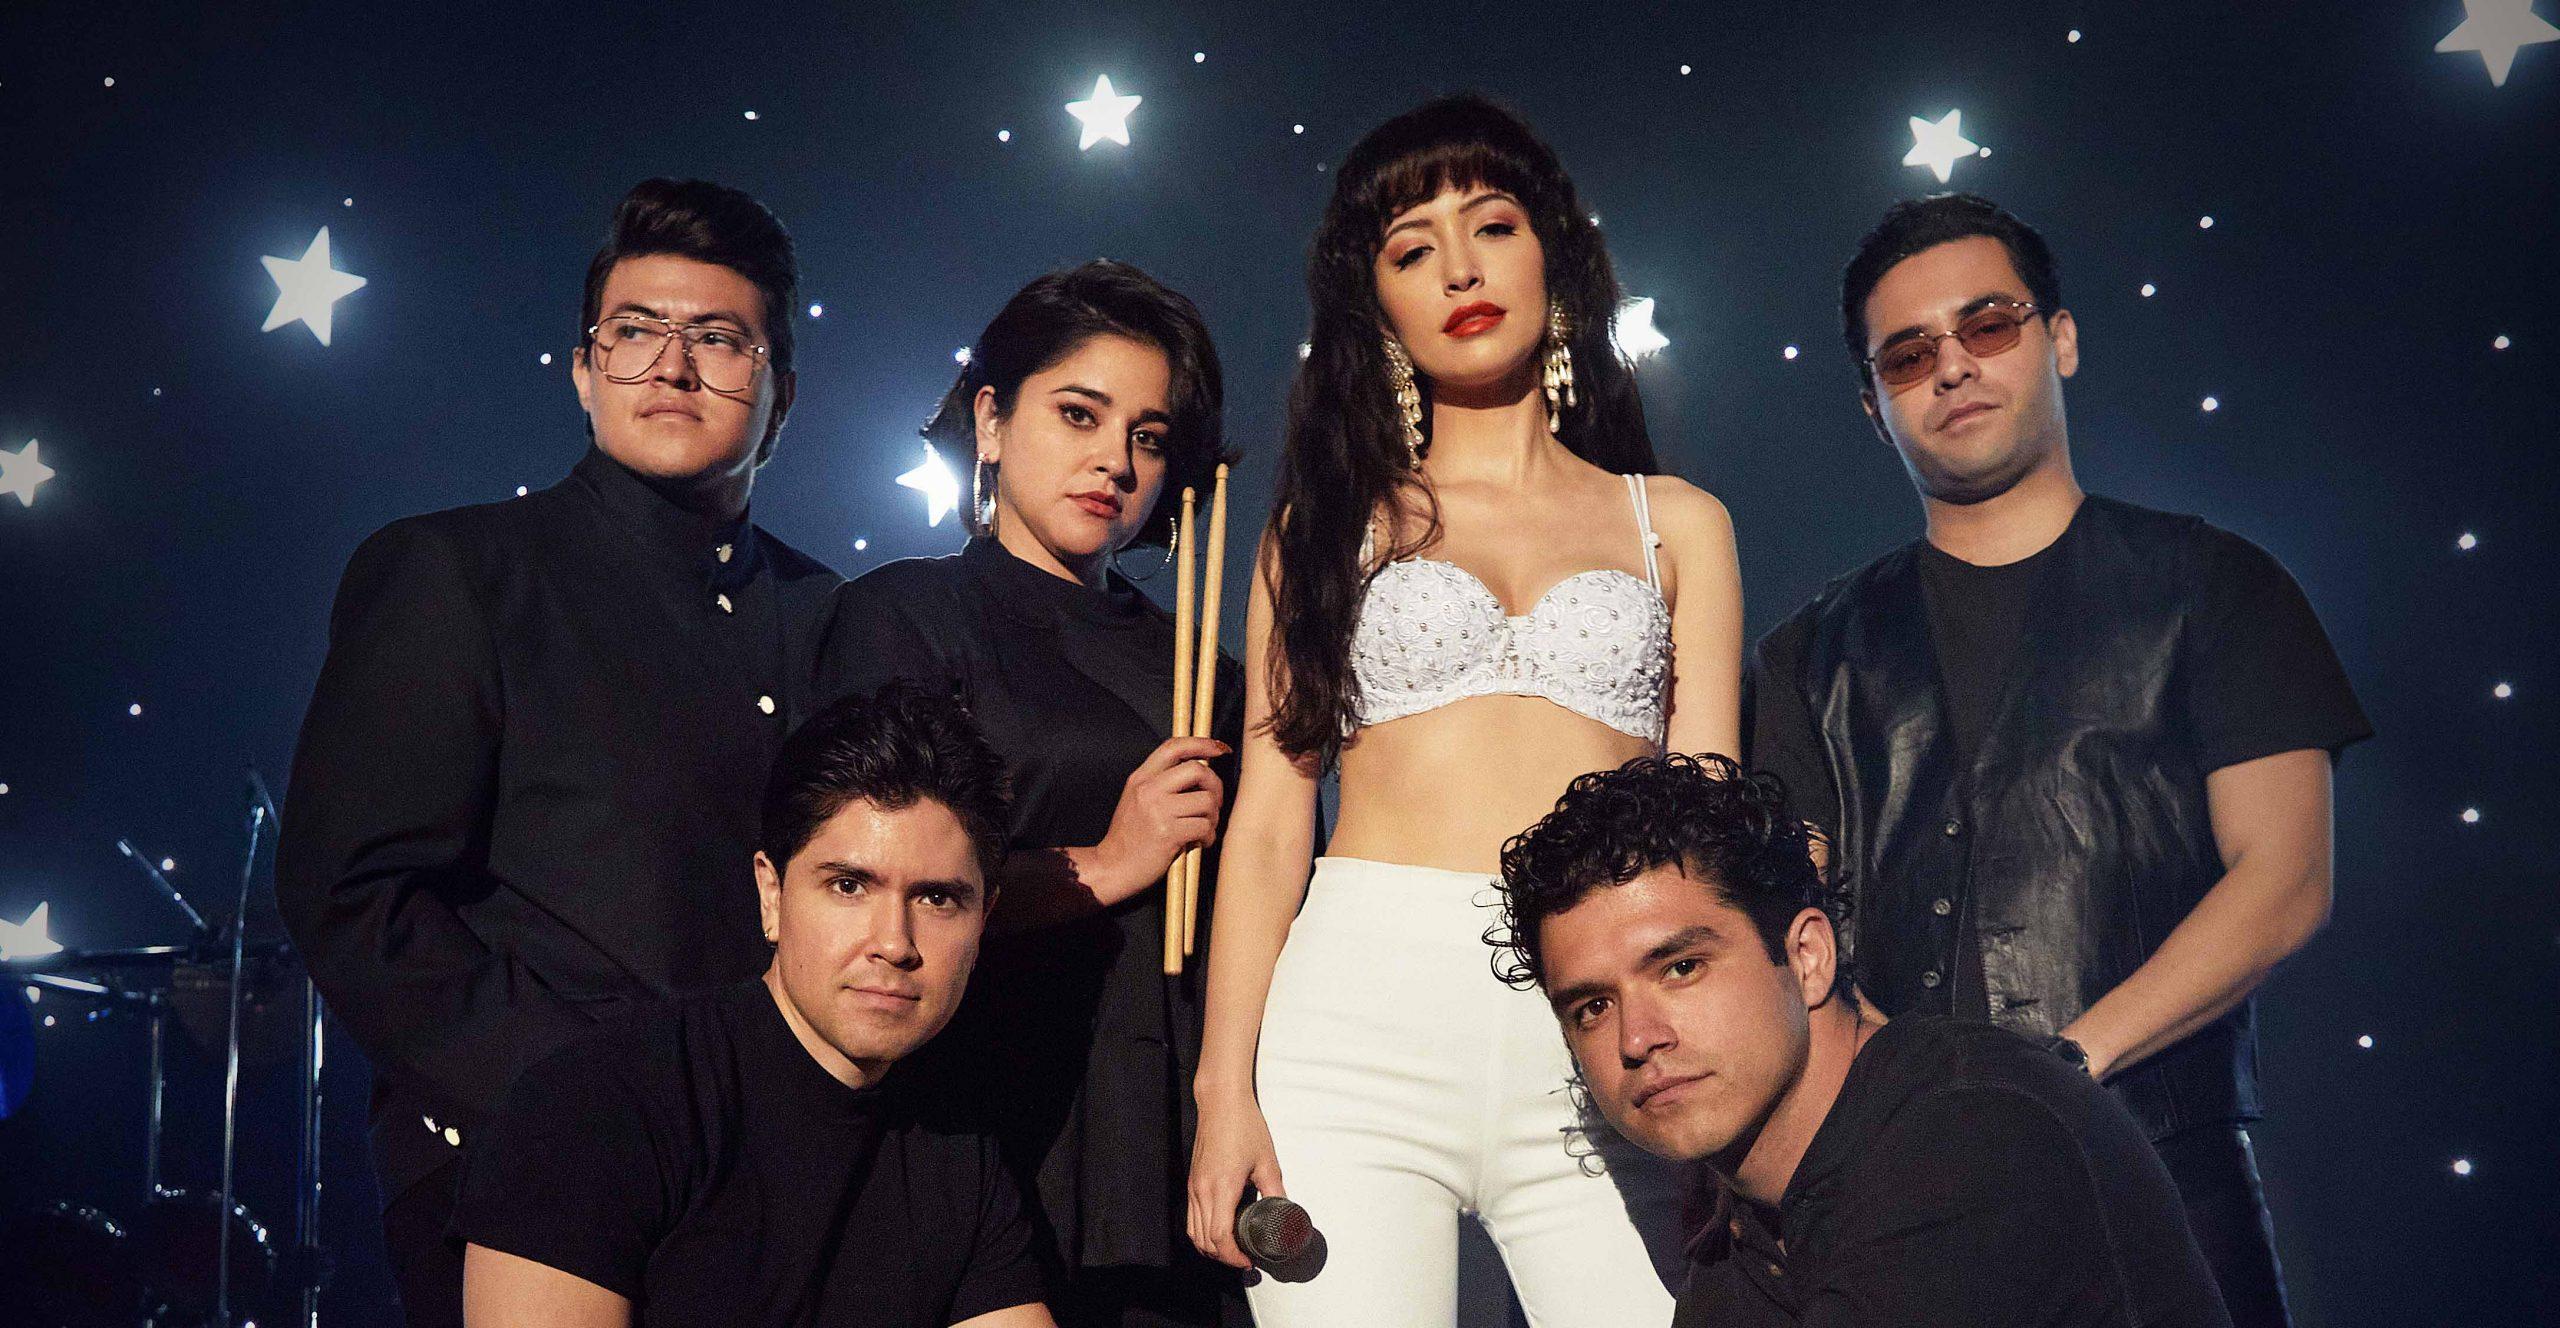 ¡Checa por acá el tráiler de 'Selena: La Serie' con Christian Serratos!